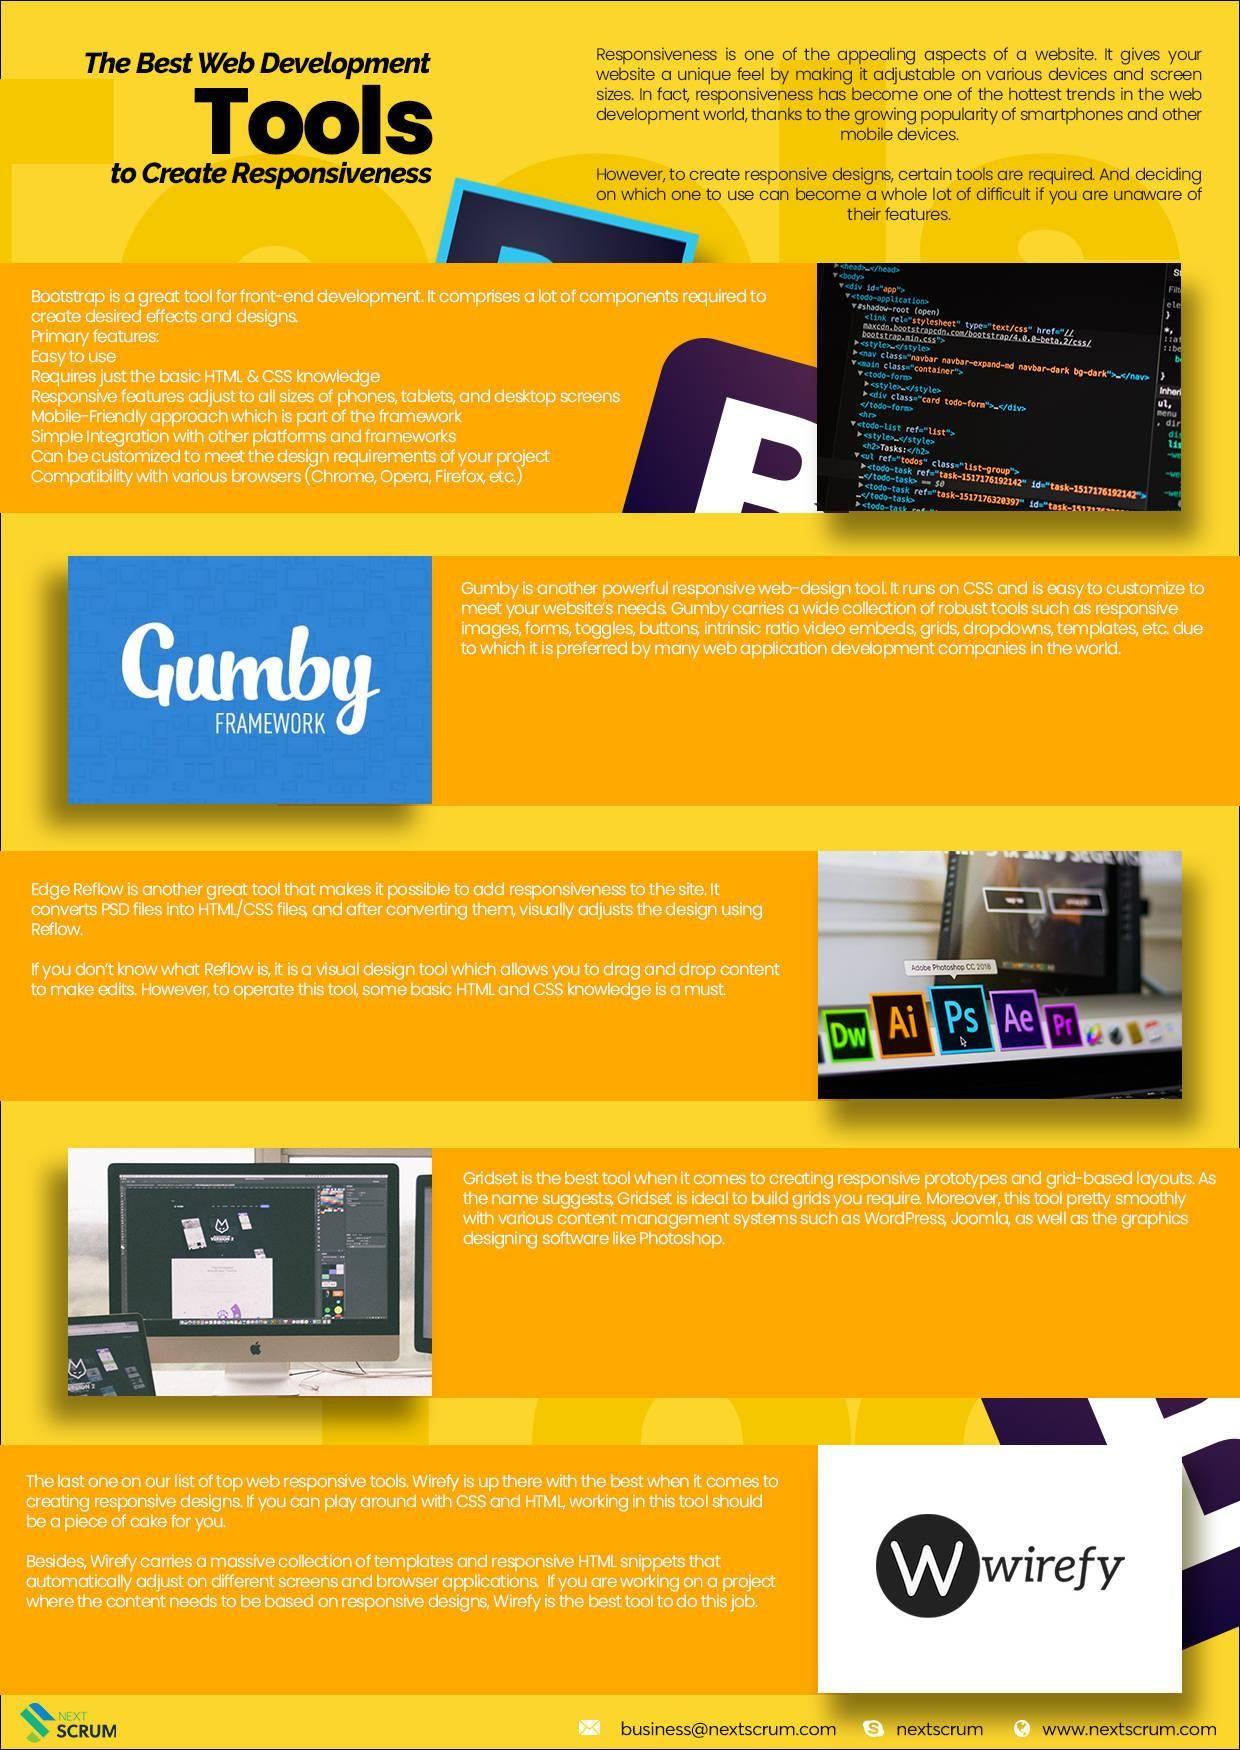 The Best Web Development Tools to Create Responsiveness